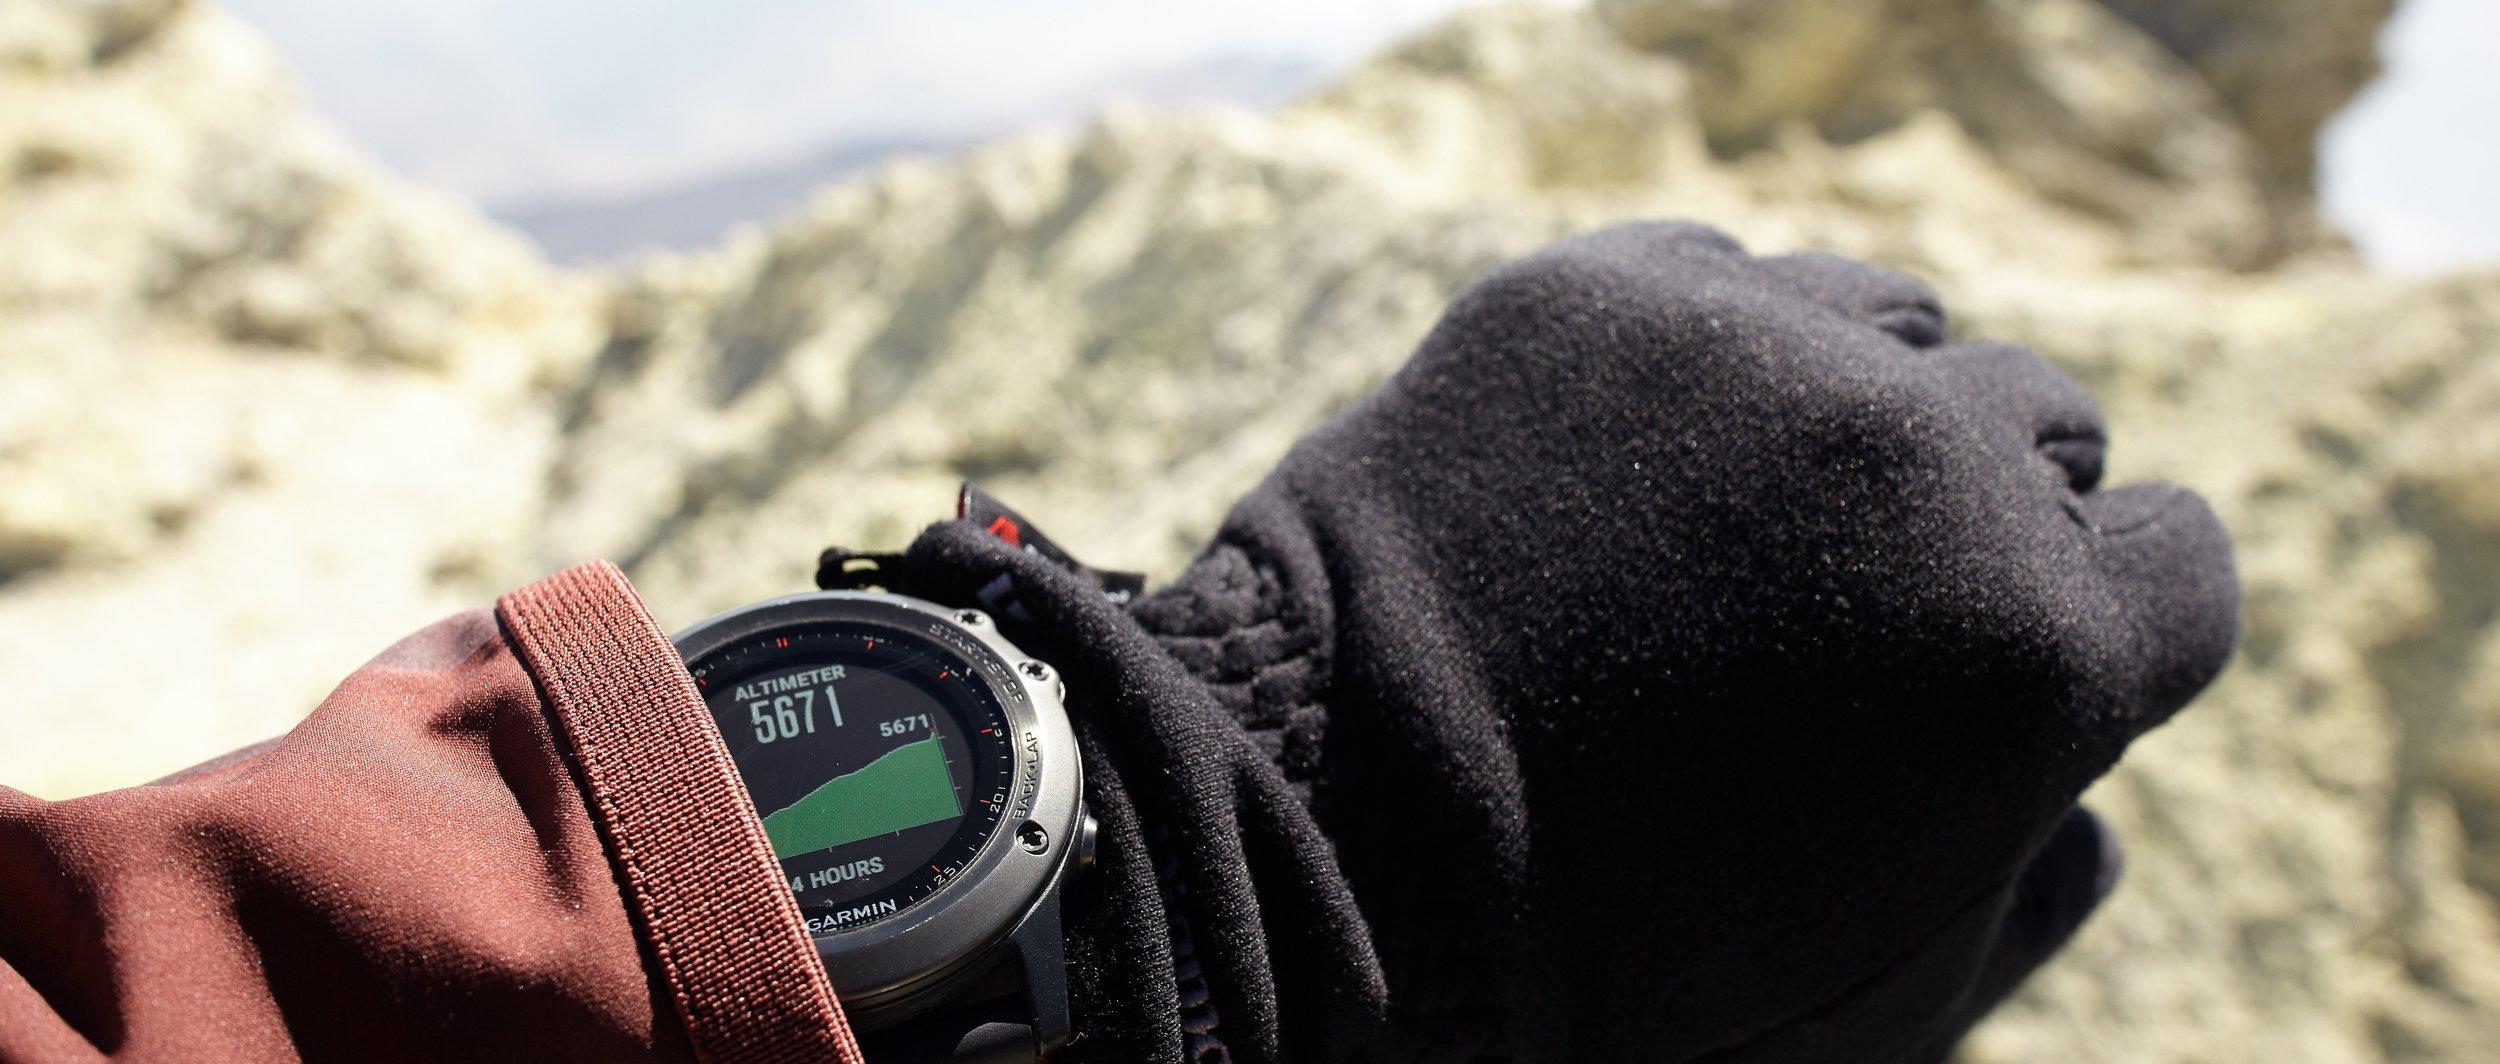 Altitude measure at Mt. Damavand, Iran